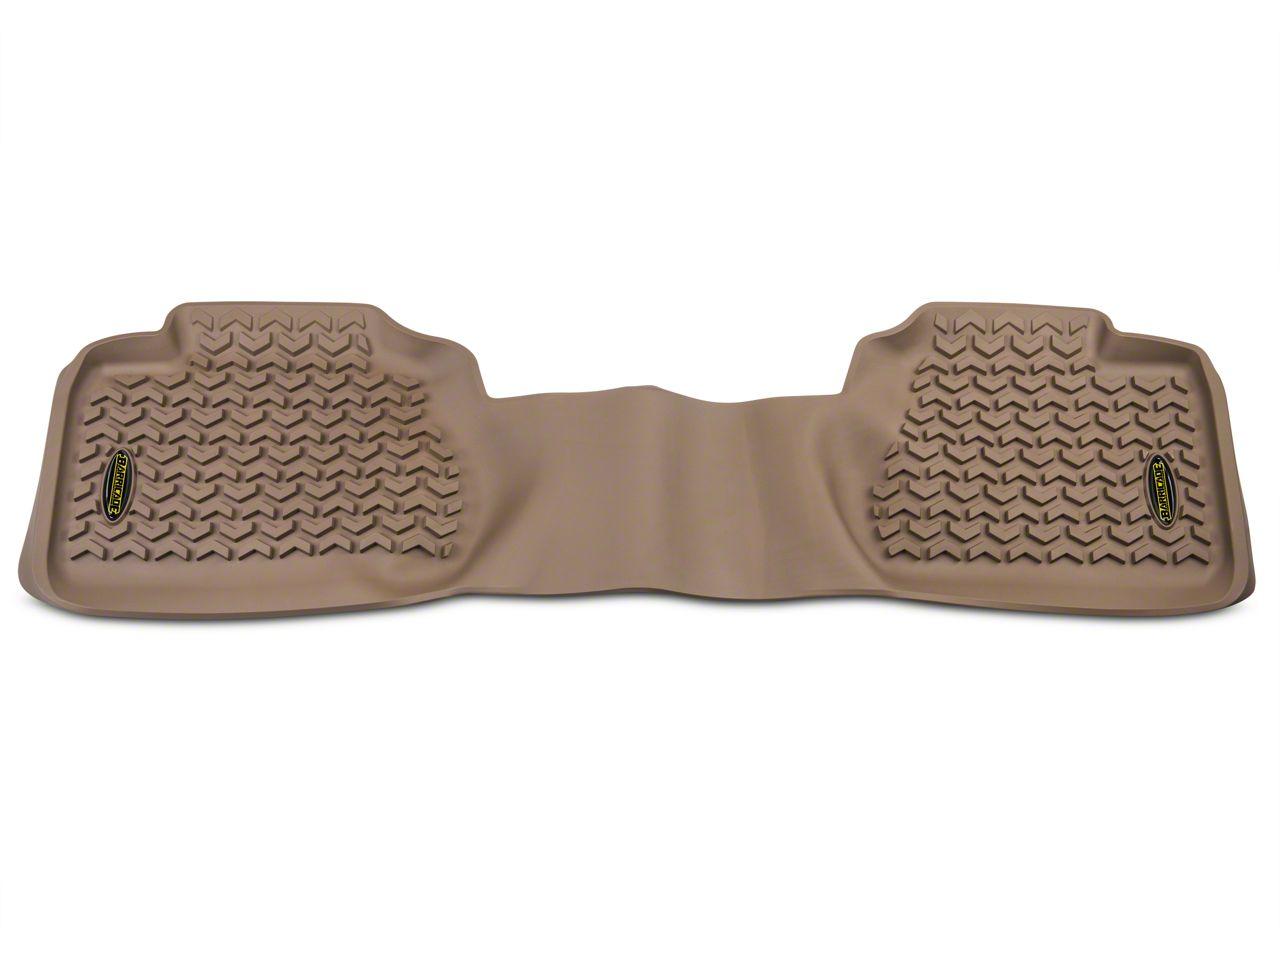 Barricade Rear Floor Mat - Tan (07-13 Sierra 1500 Extended Cab)